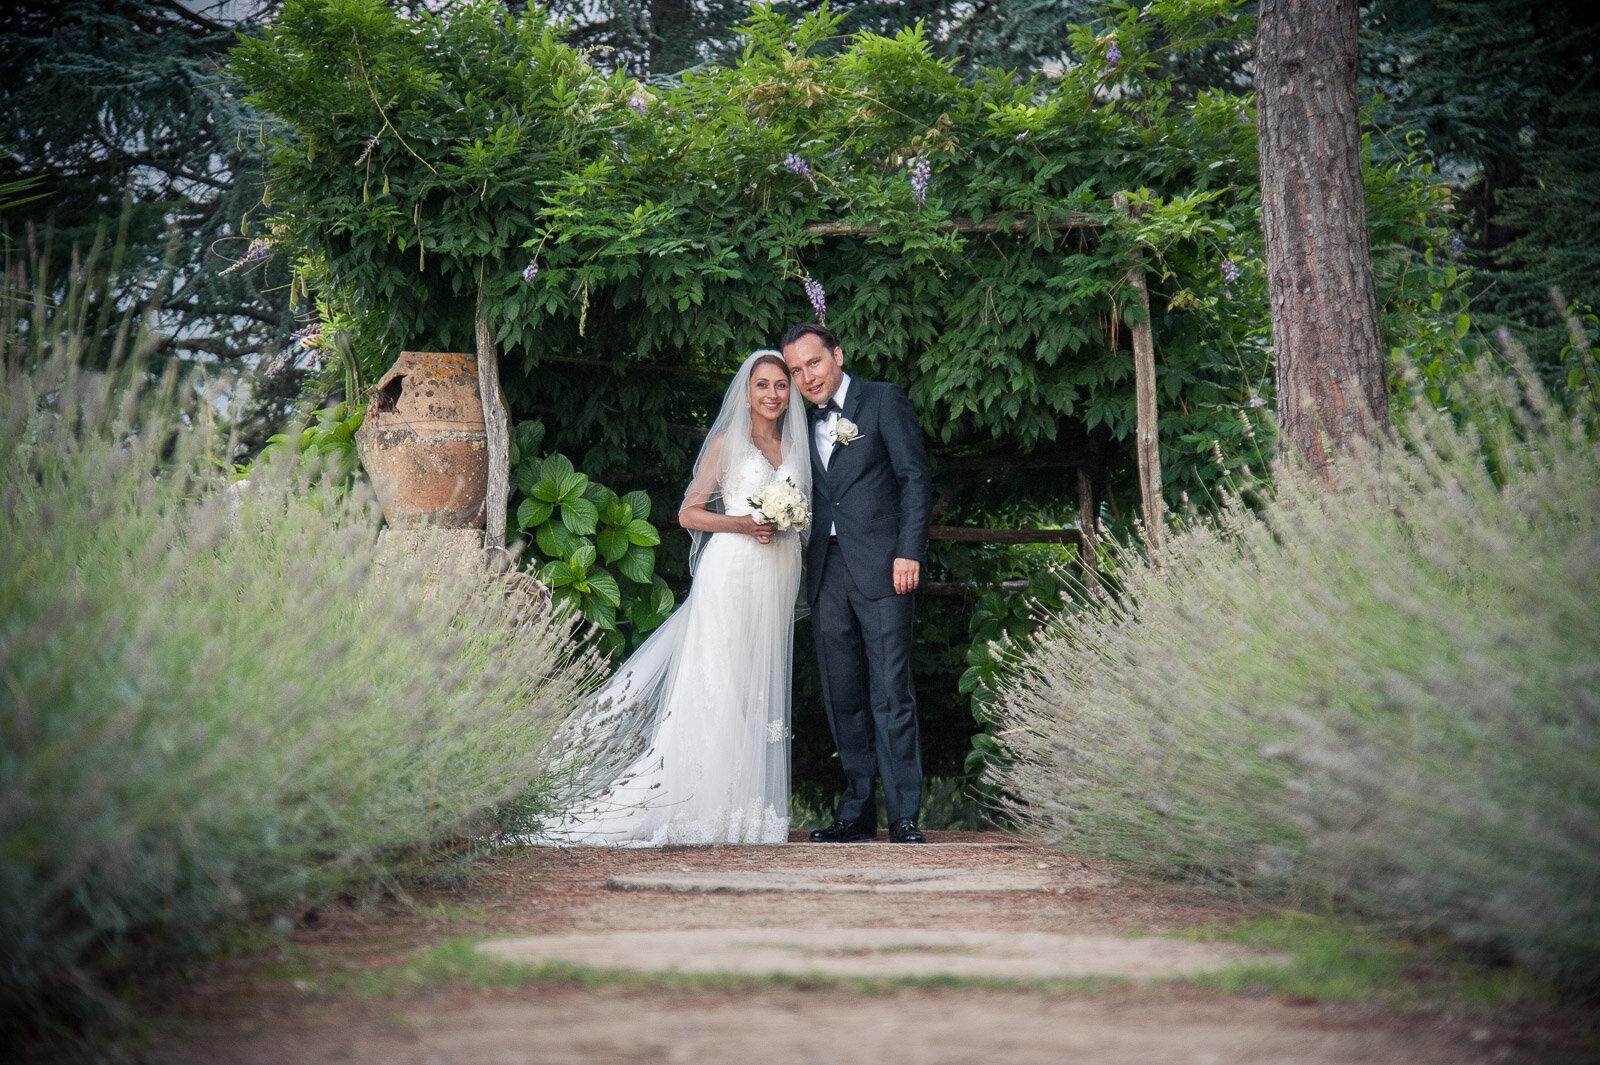 Russian Wedding in Villa Cimbrone Costiera Amalfitana 23.jpg